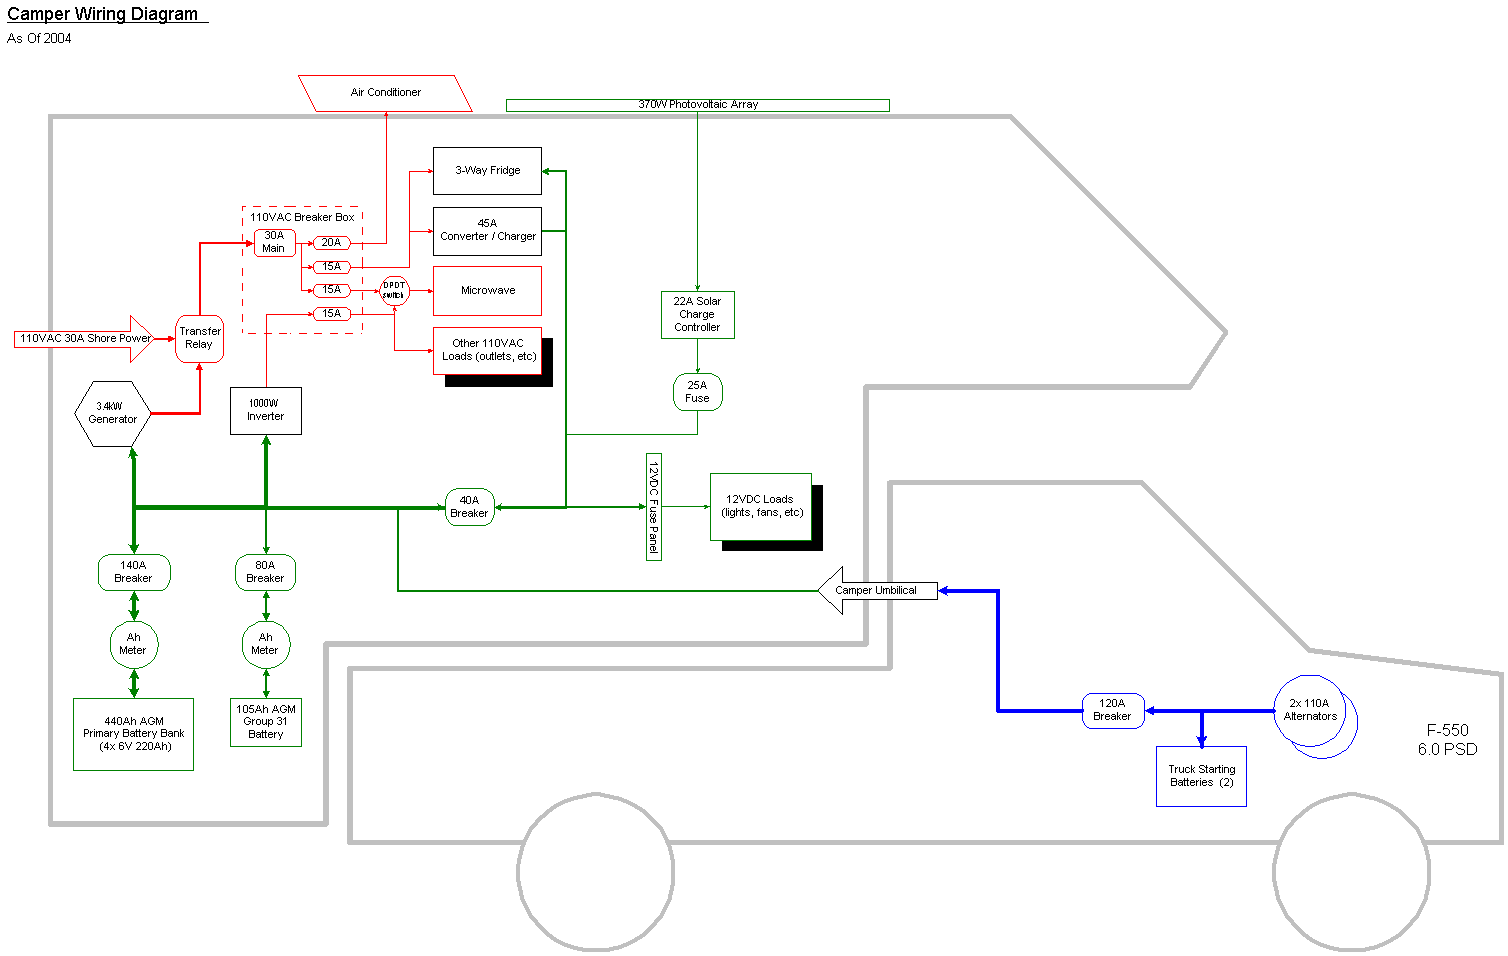 2004 Camper Wiring Diagram